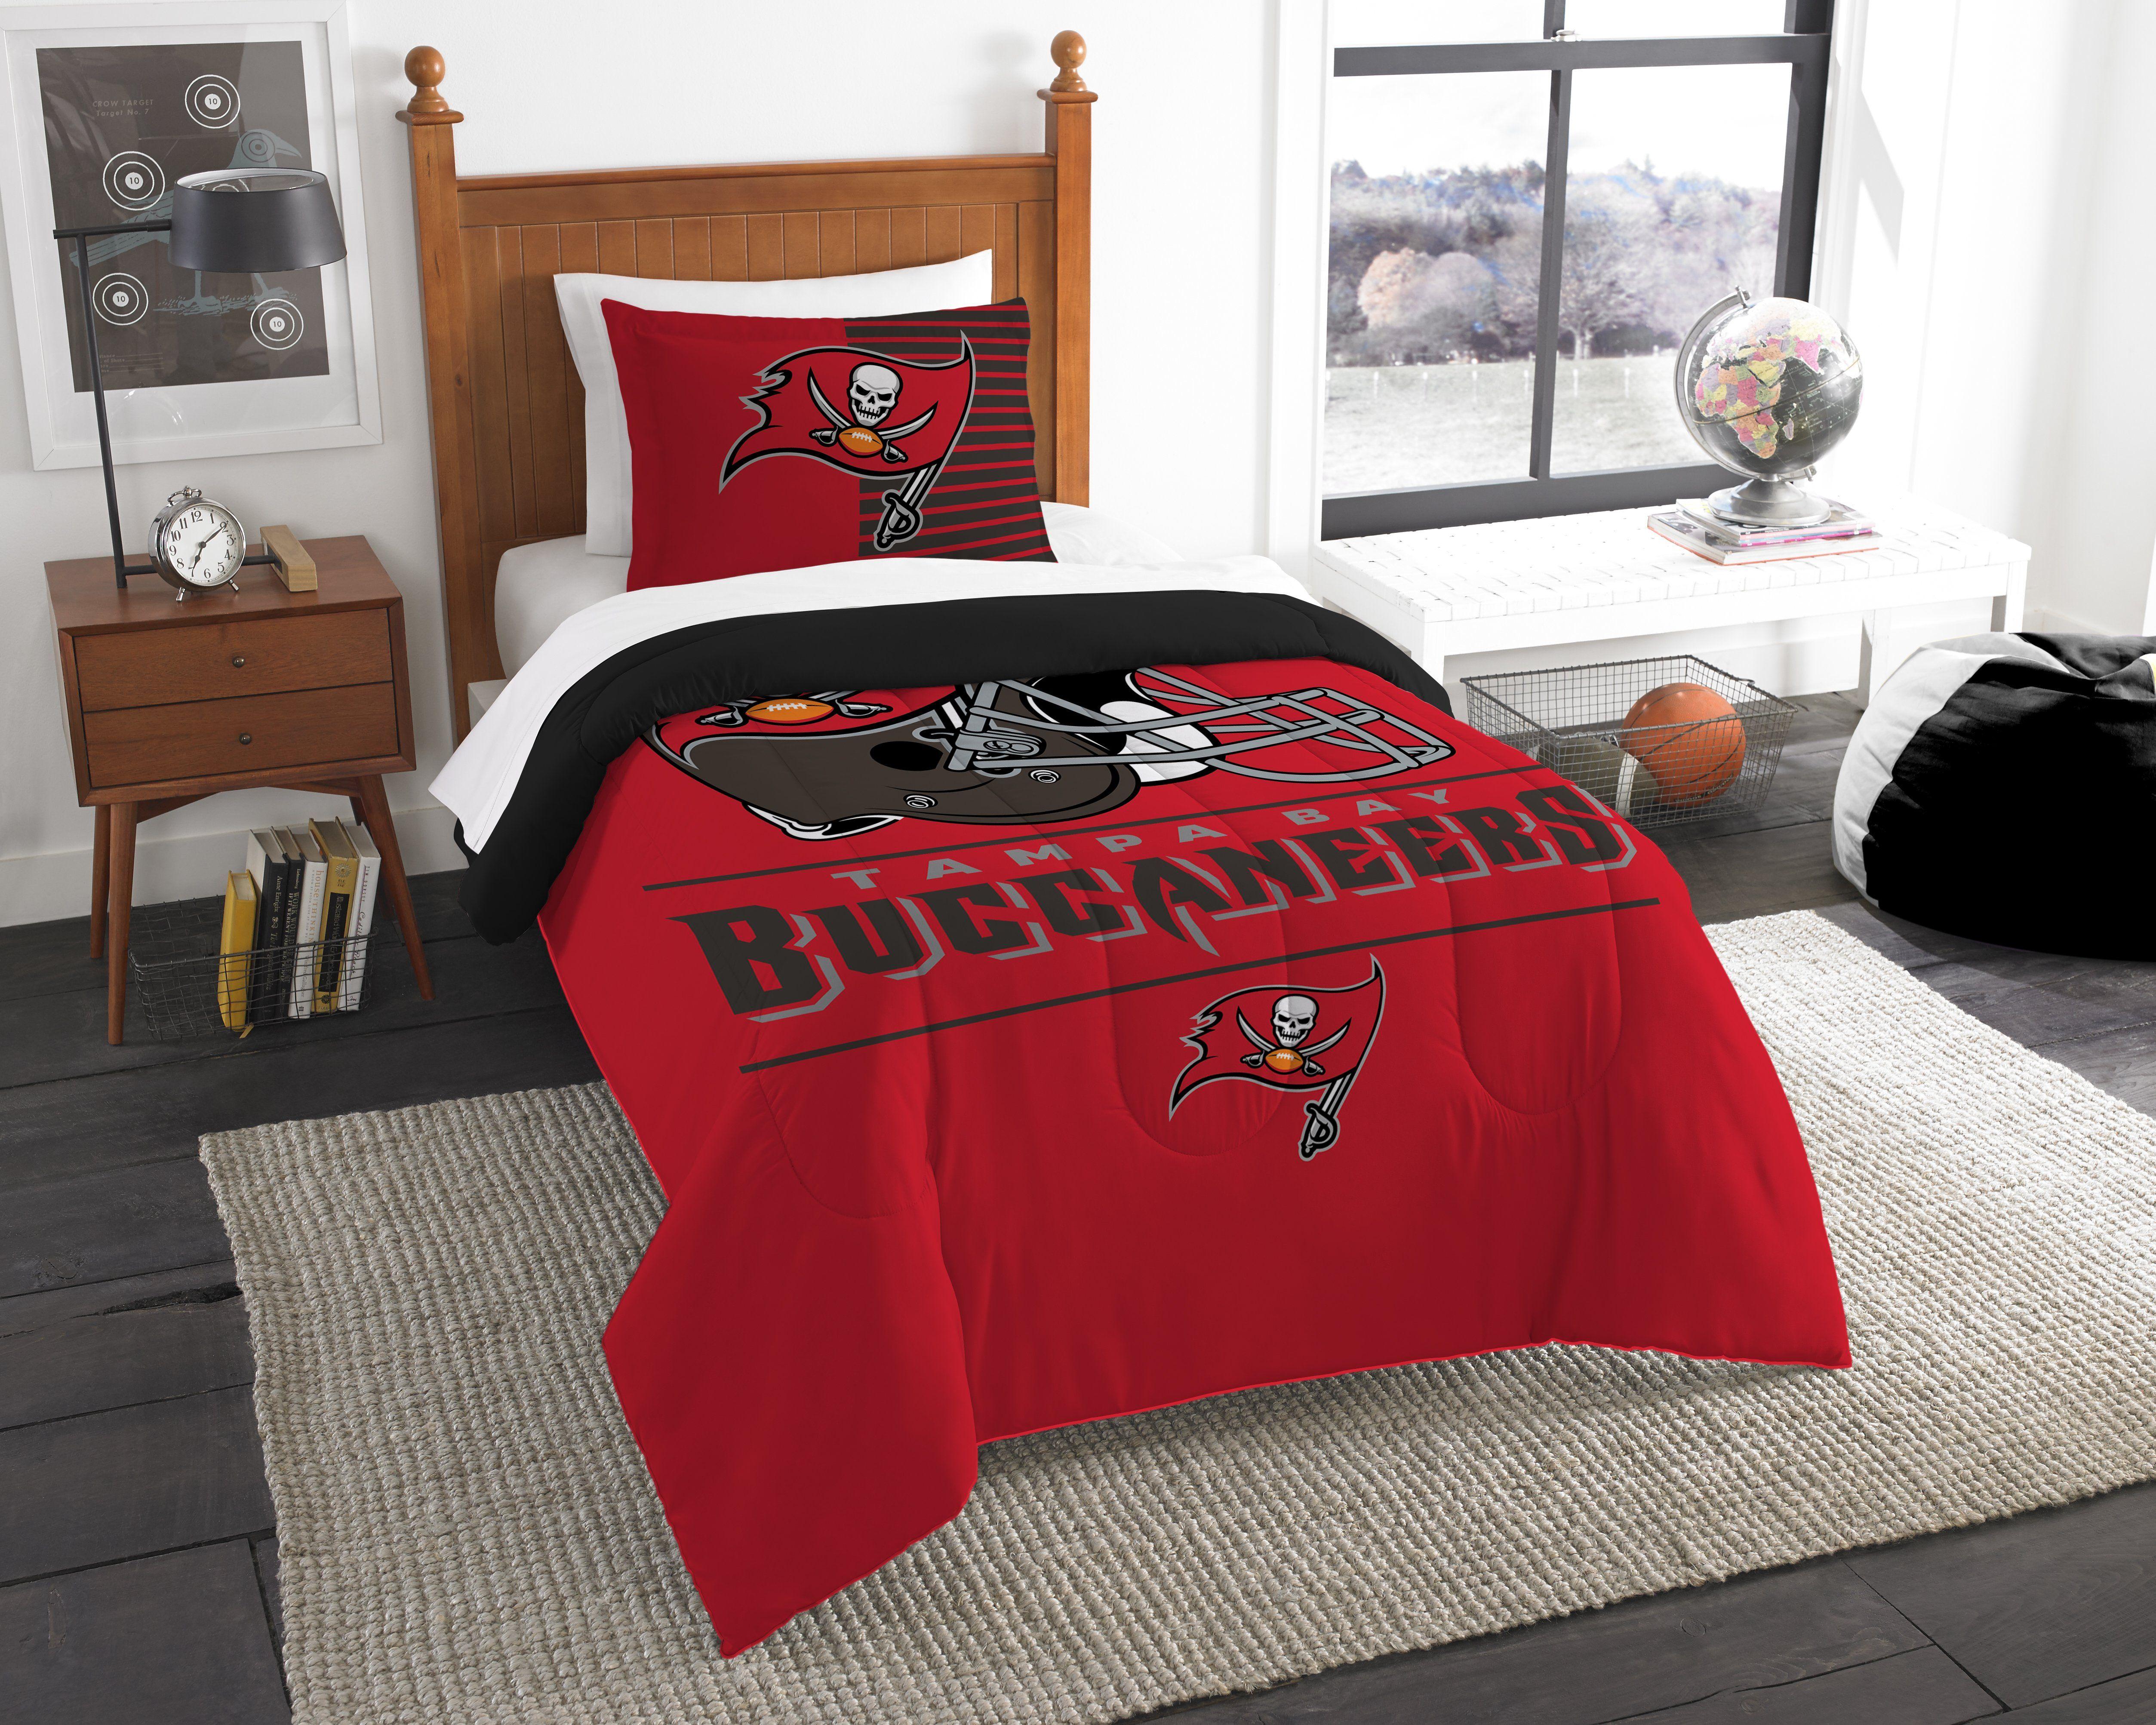 Bucs Official National Football League Bedding Draft Printed Twin Comforter 64 X 86 1 Sham Twin Comforter Sets Comforter Sets Twin Comforter